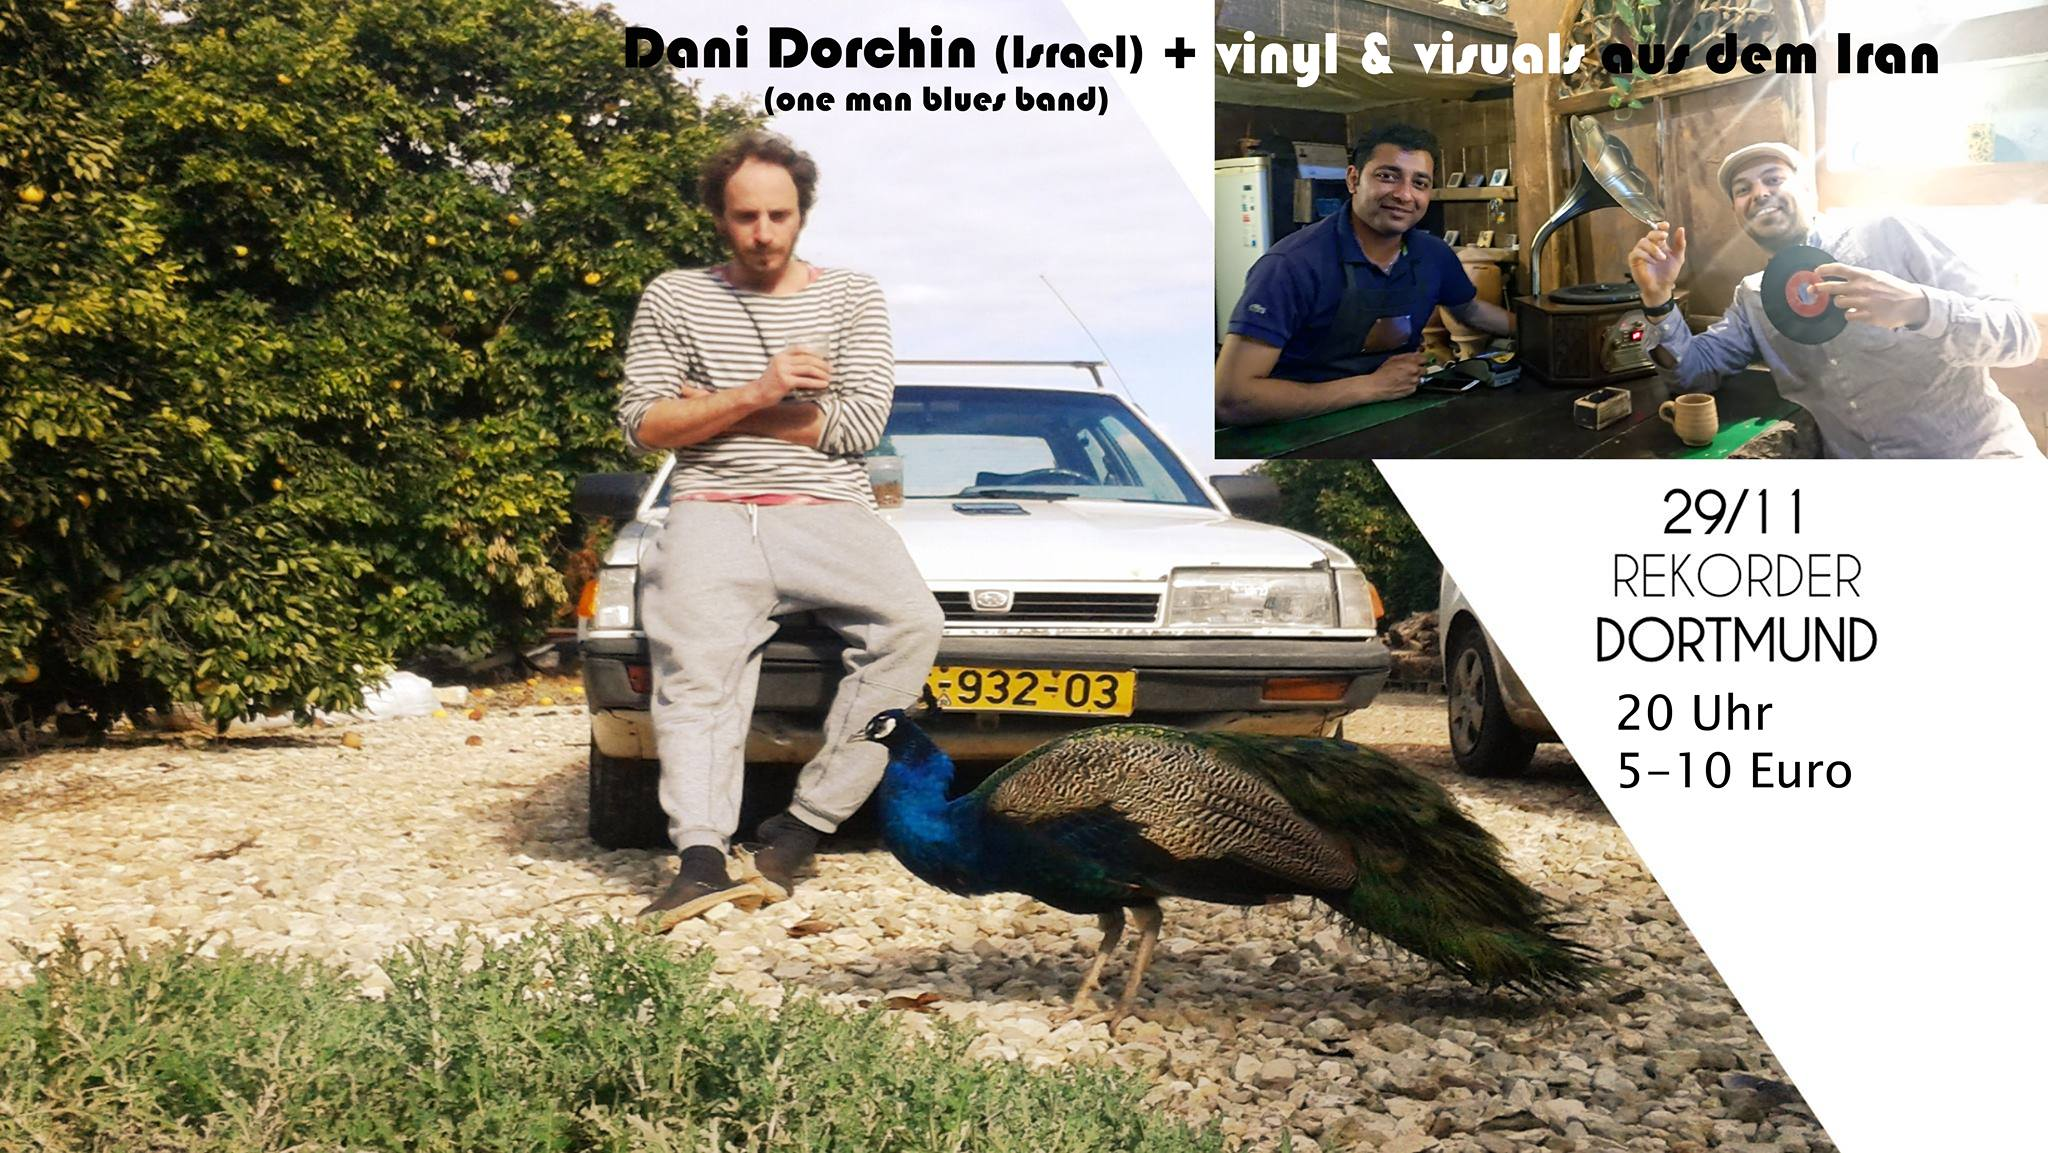 Dani Dorchin (Israel) + vinyl & visuals from Iran